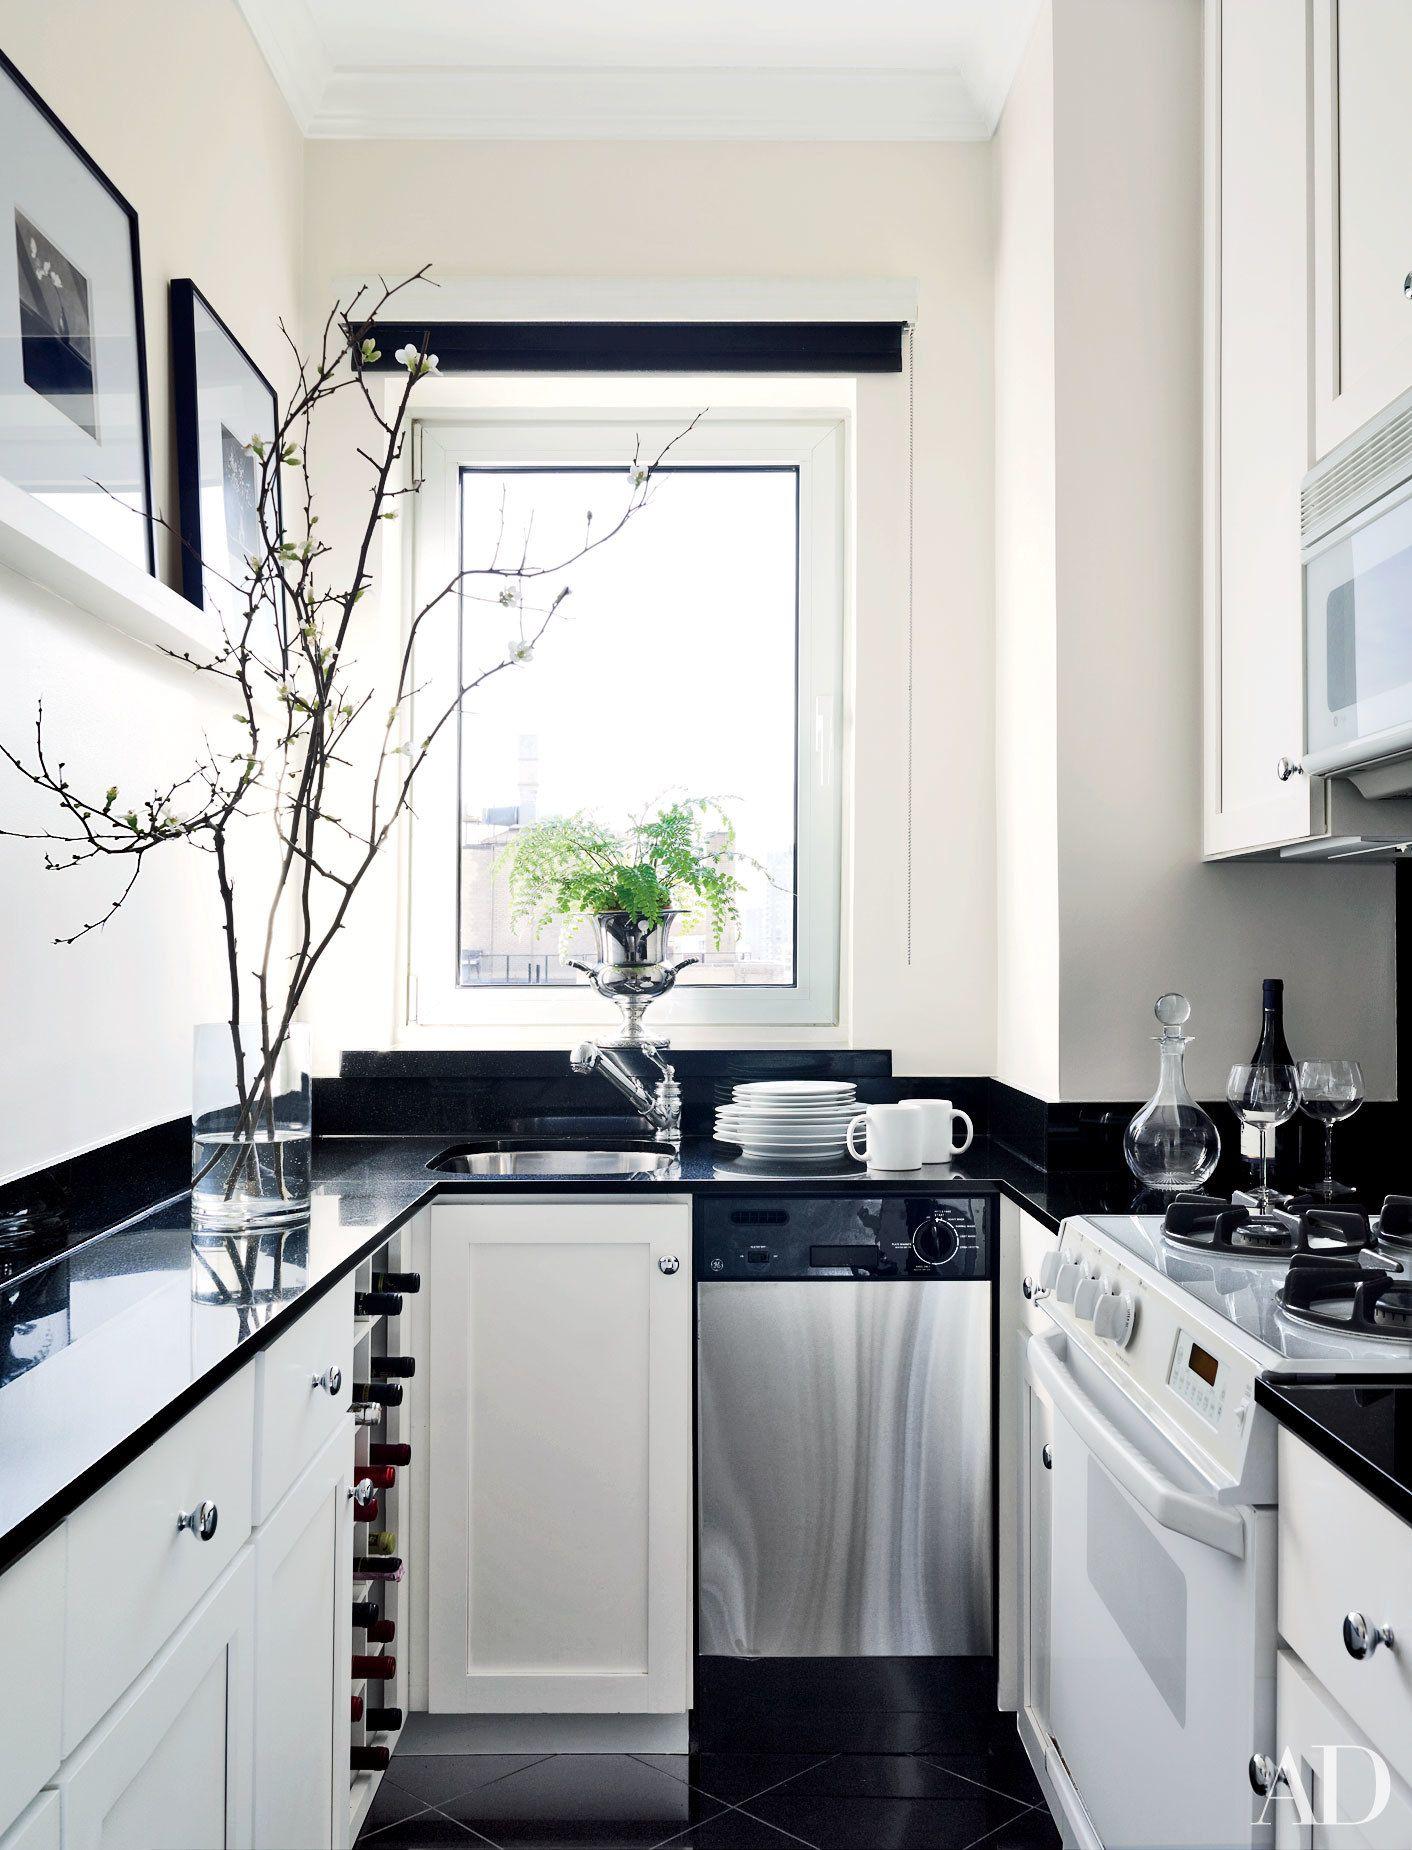 25 Black Countertops to Inspire Your Kitchen Renovation | Black ...